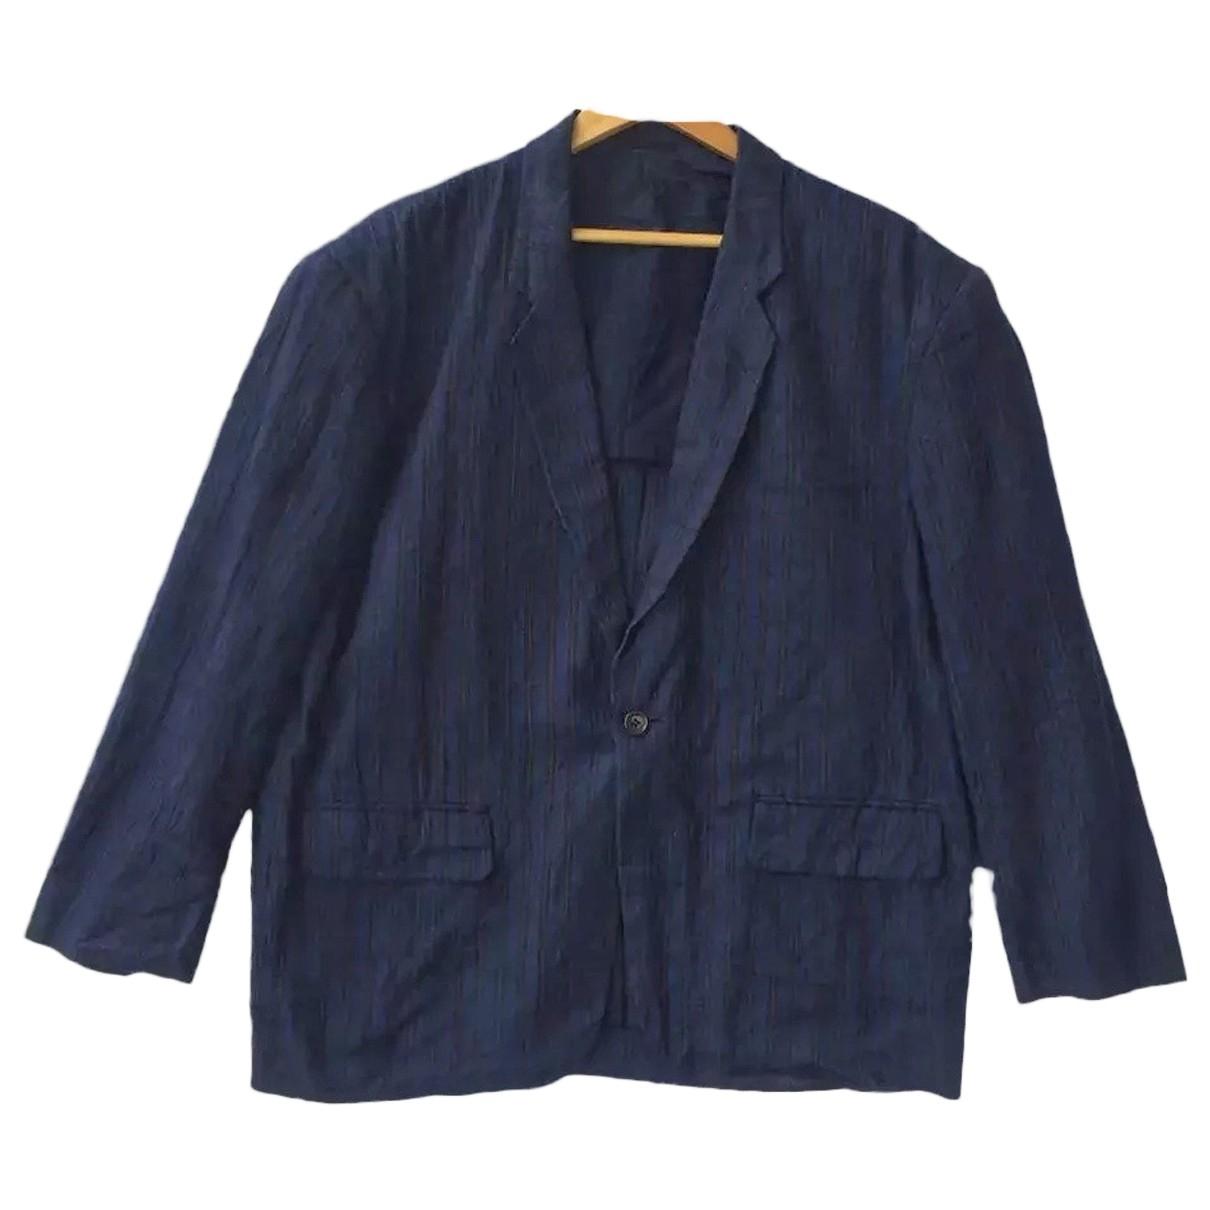 Comme Des Garcons \N Navy Cotton jacket  for Men M International